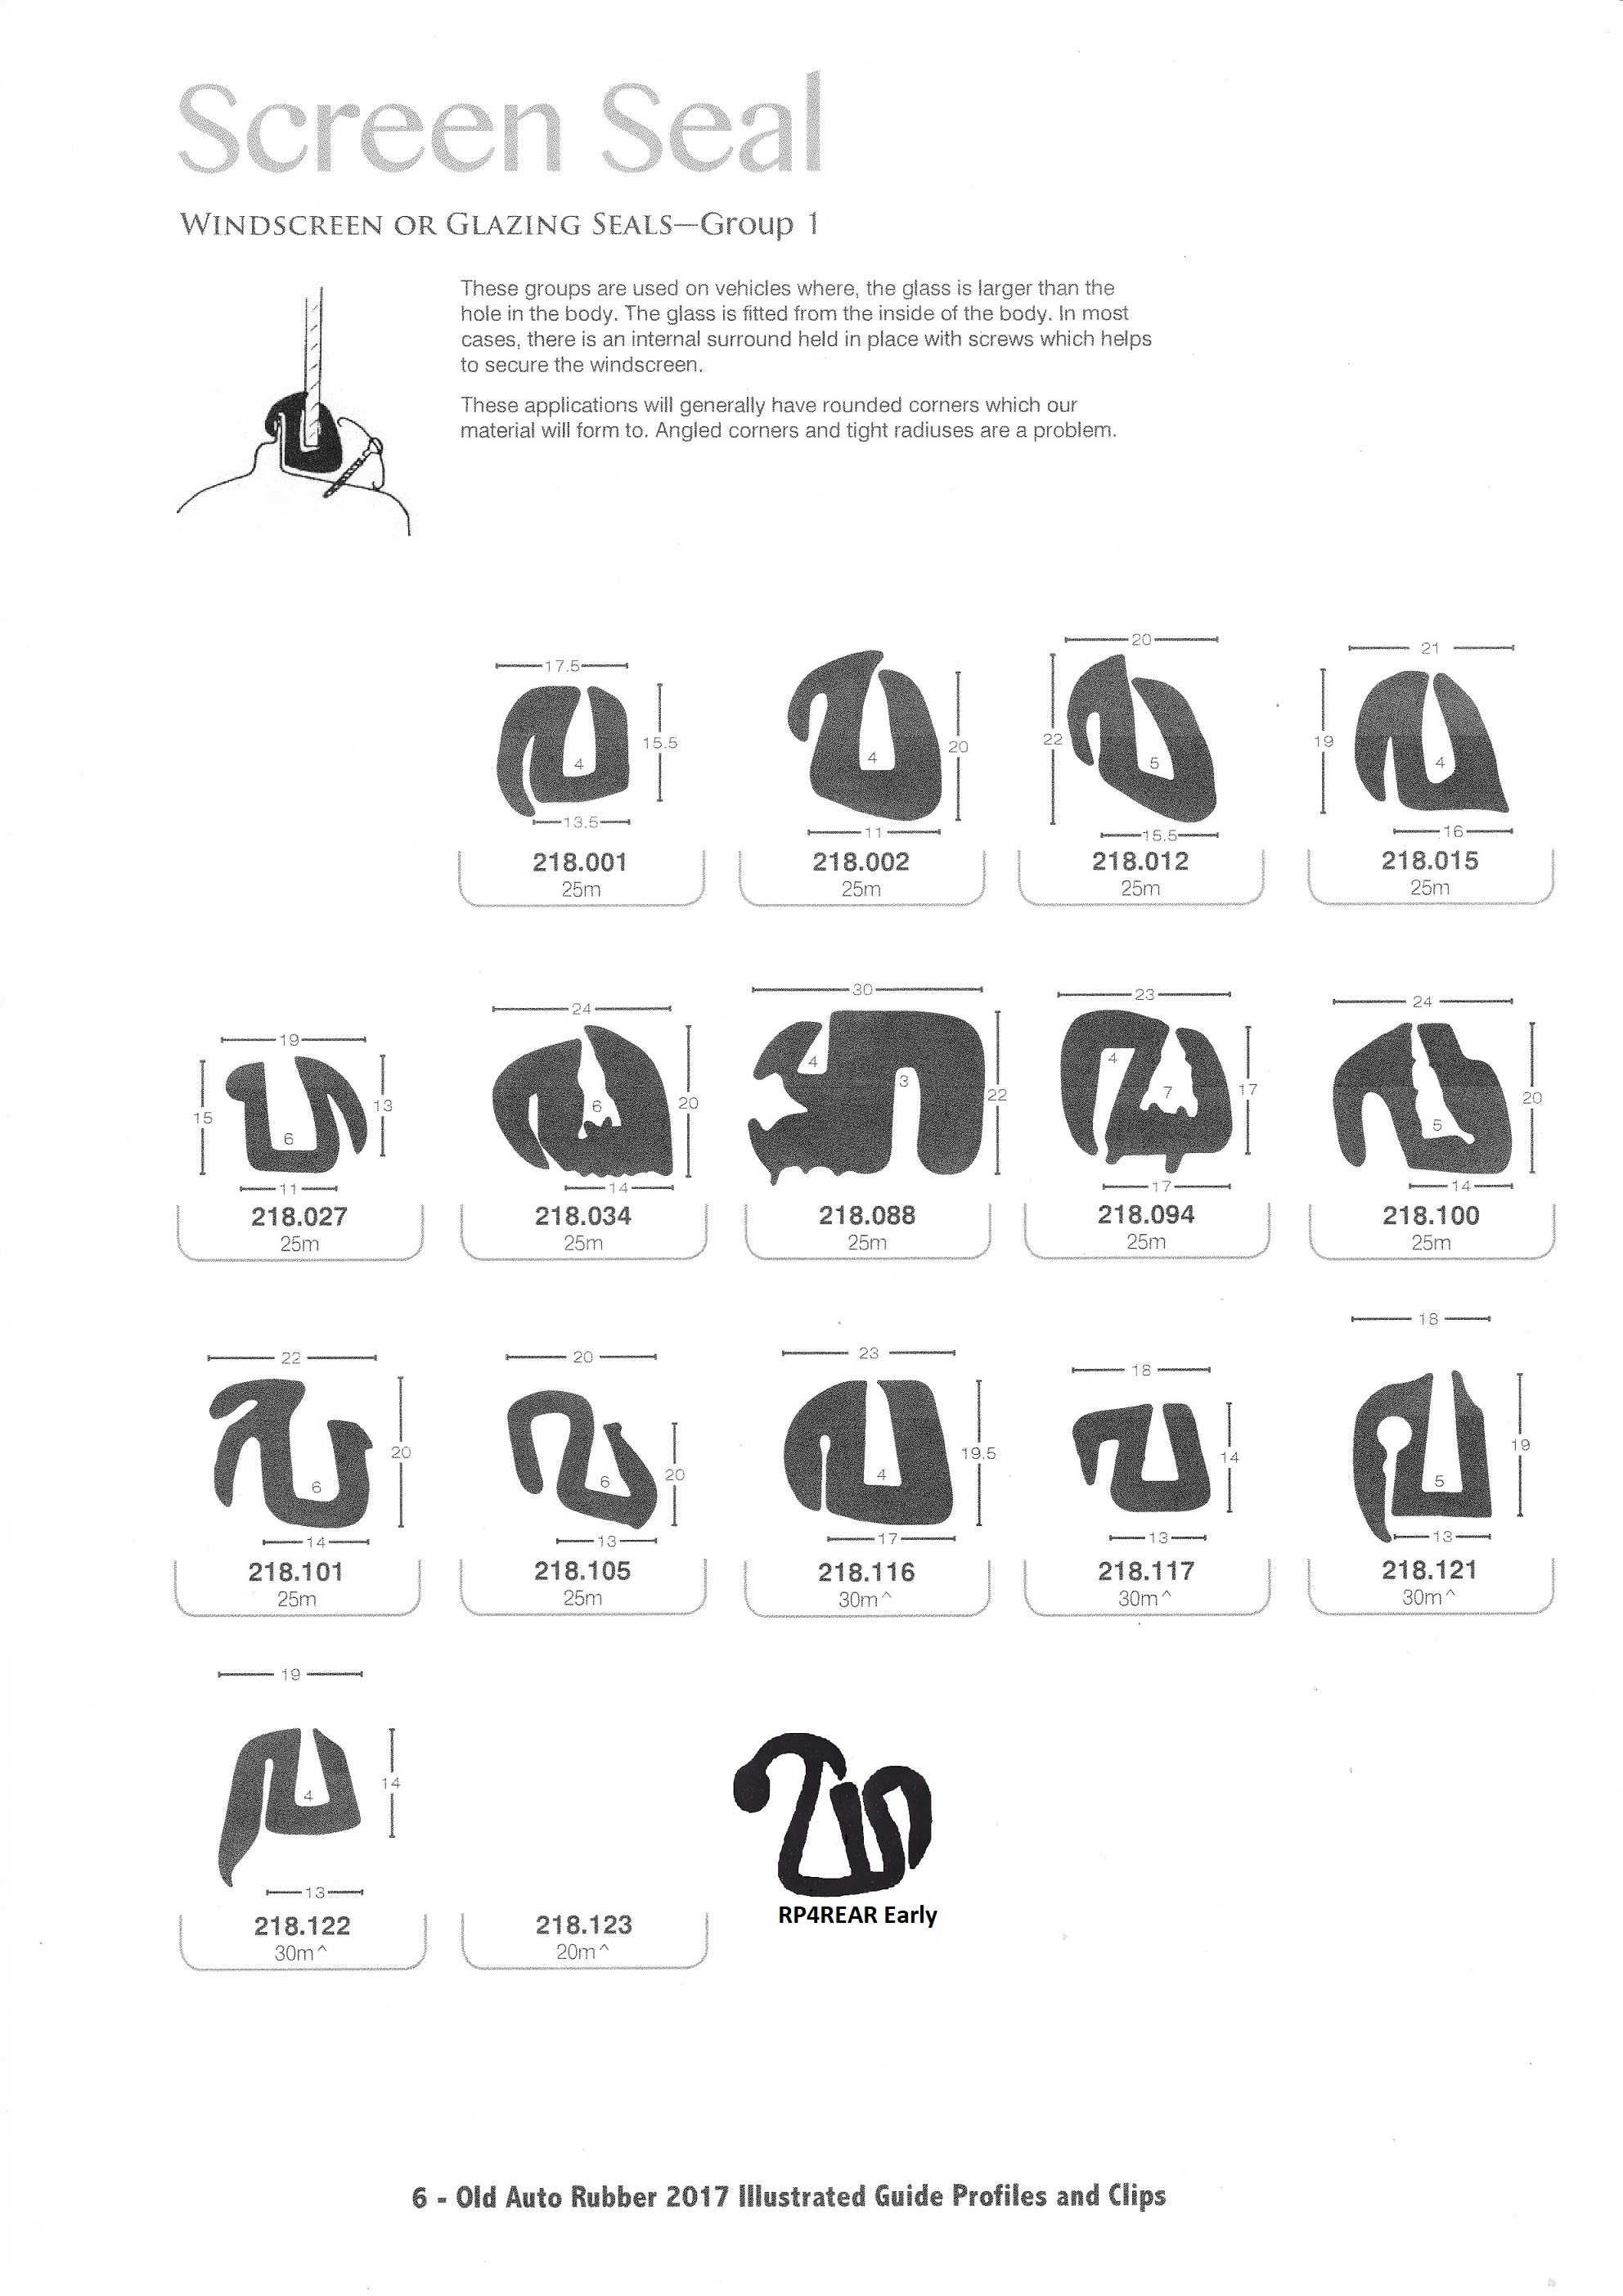 Scott Old Auto Rubber Catalogue